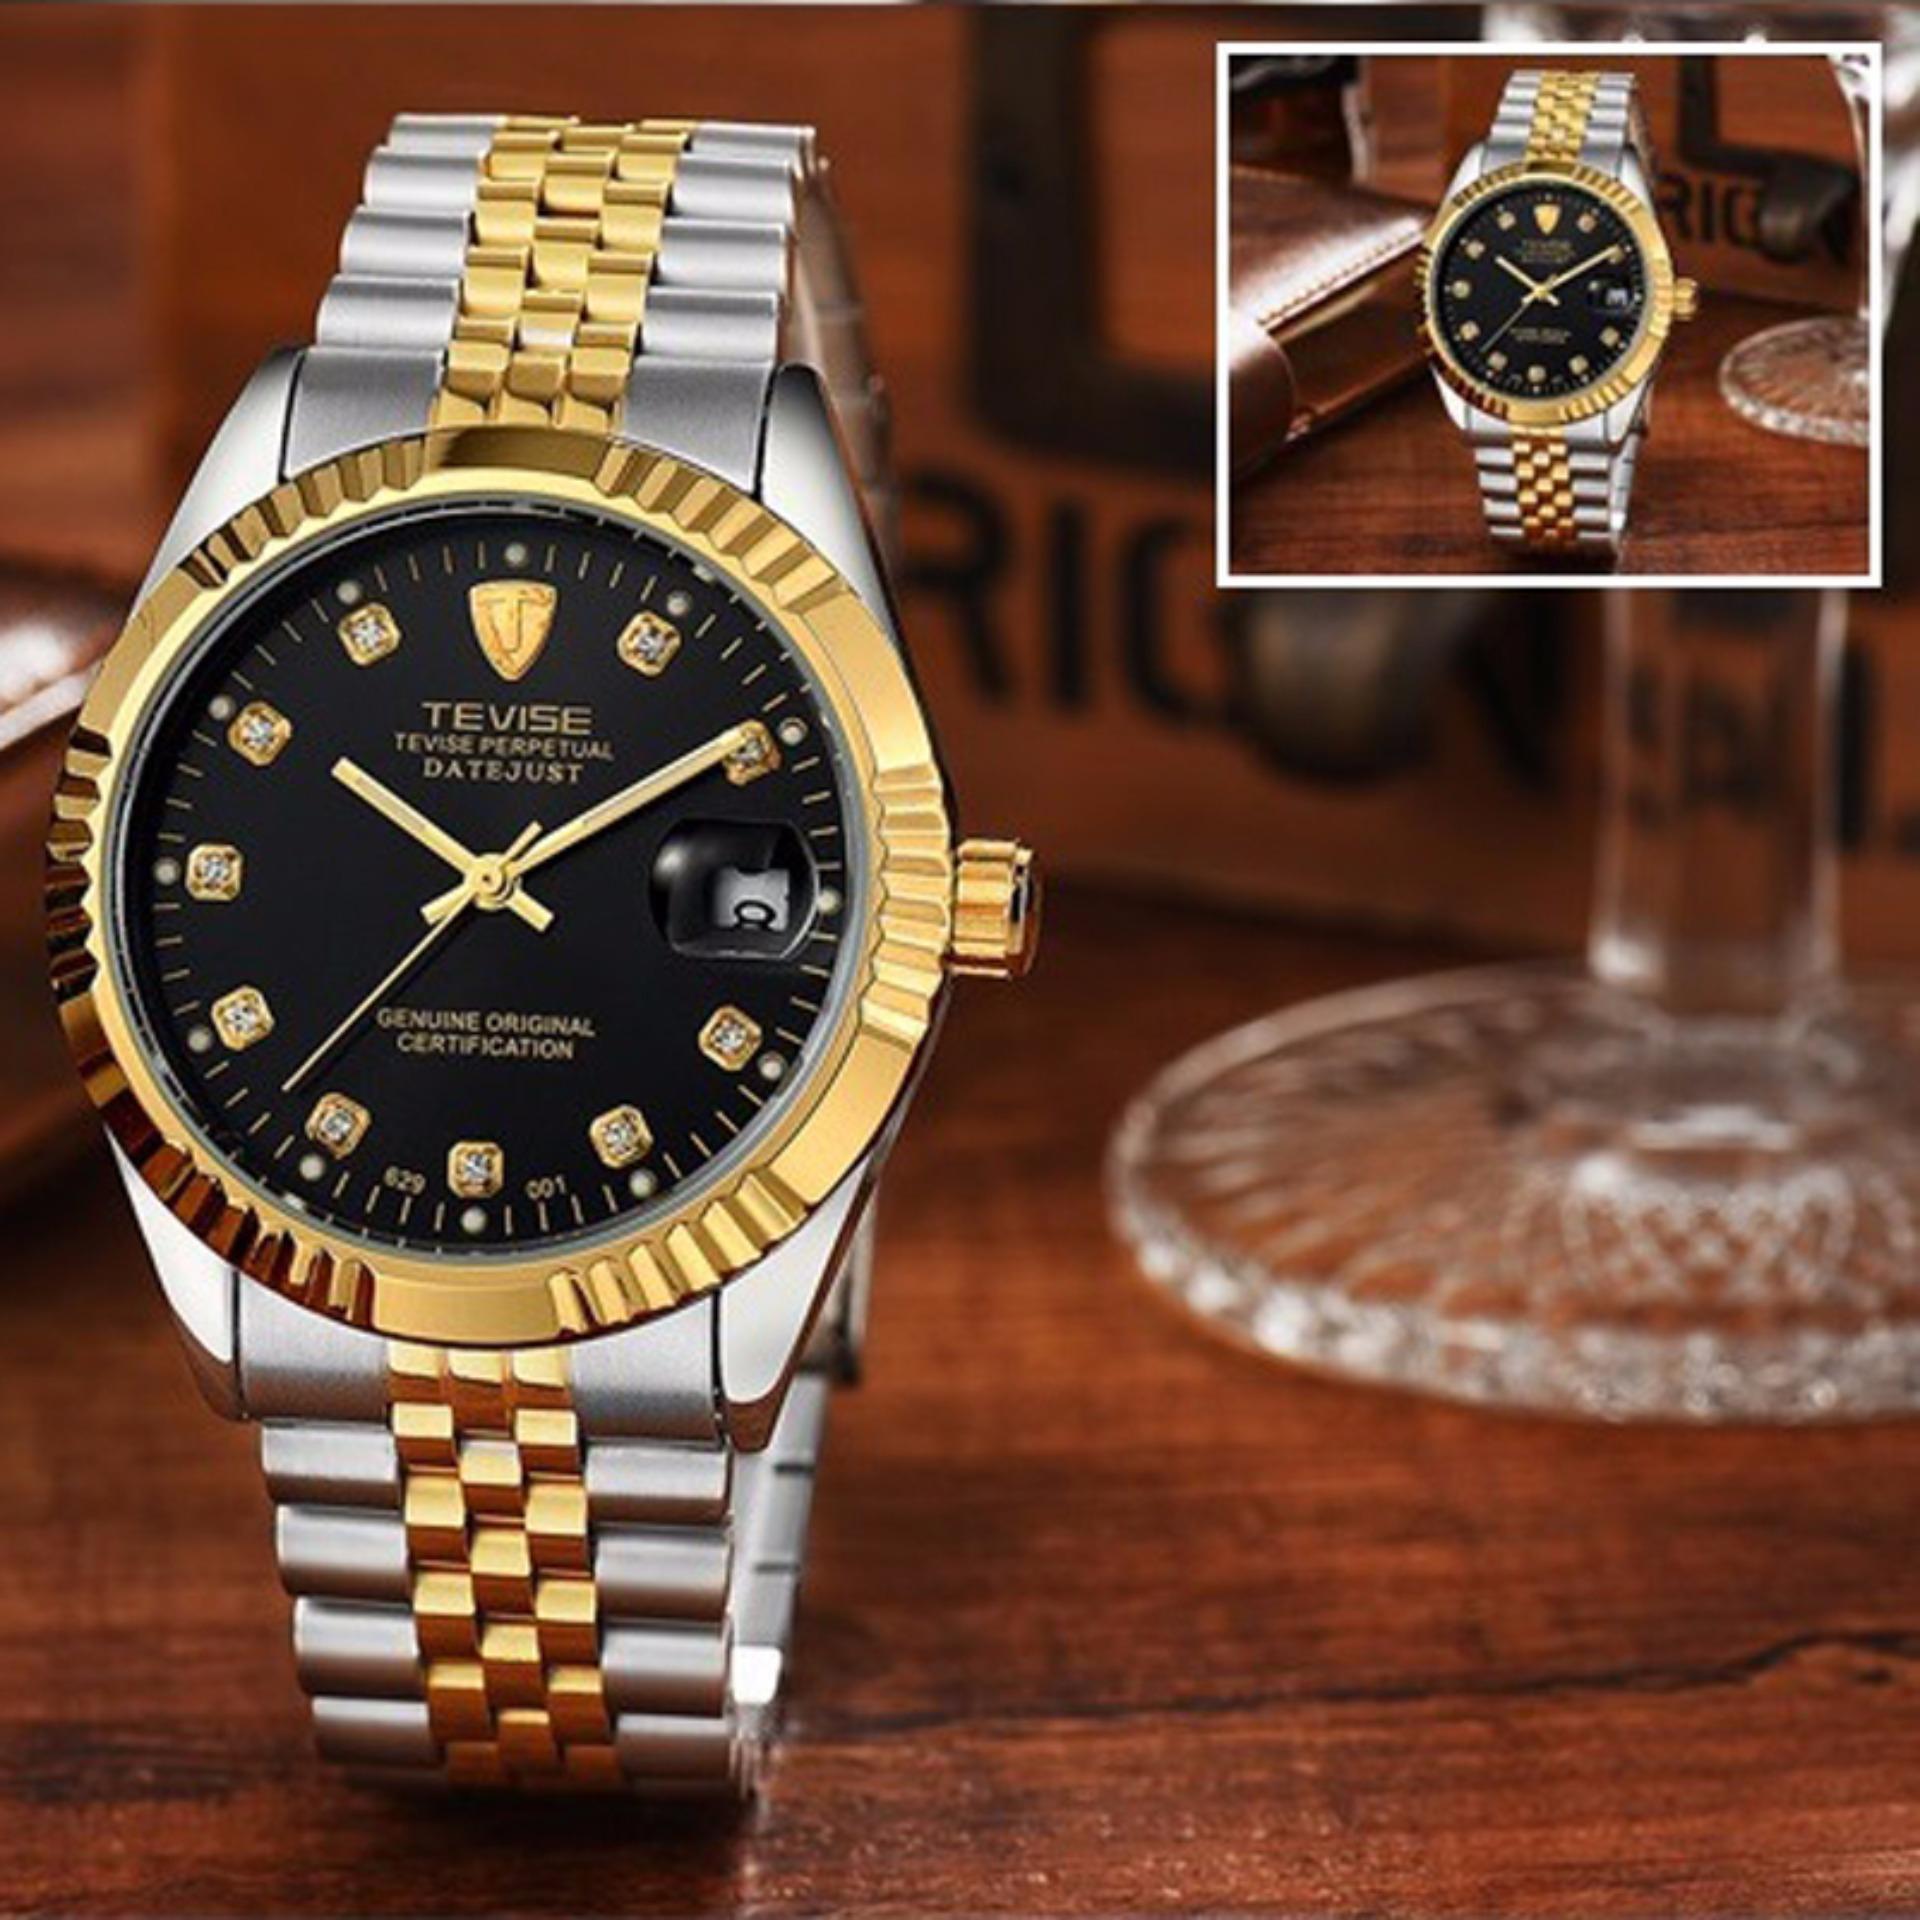 Top Brand Luxury Waterproof Automatic Watch Men Mechanical Watch Luminous Sport Casual Watch Relogio Automatico Masculino TEVISE(Black) - intl